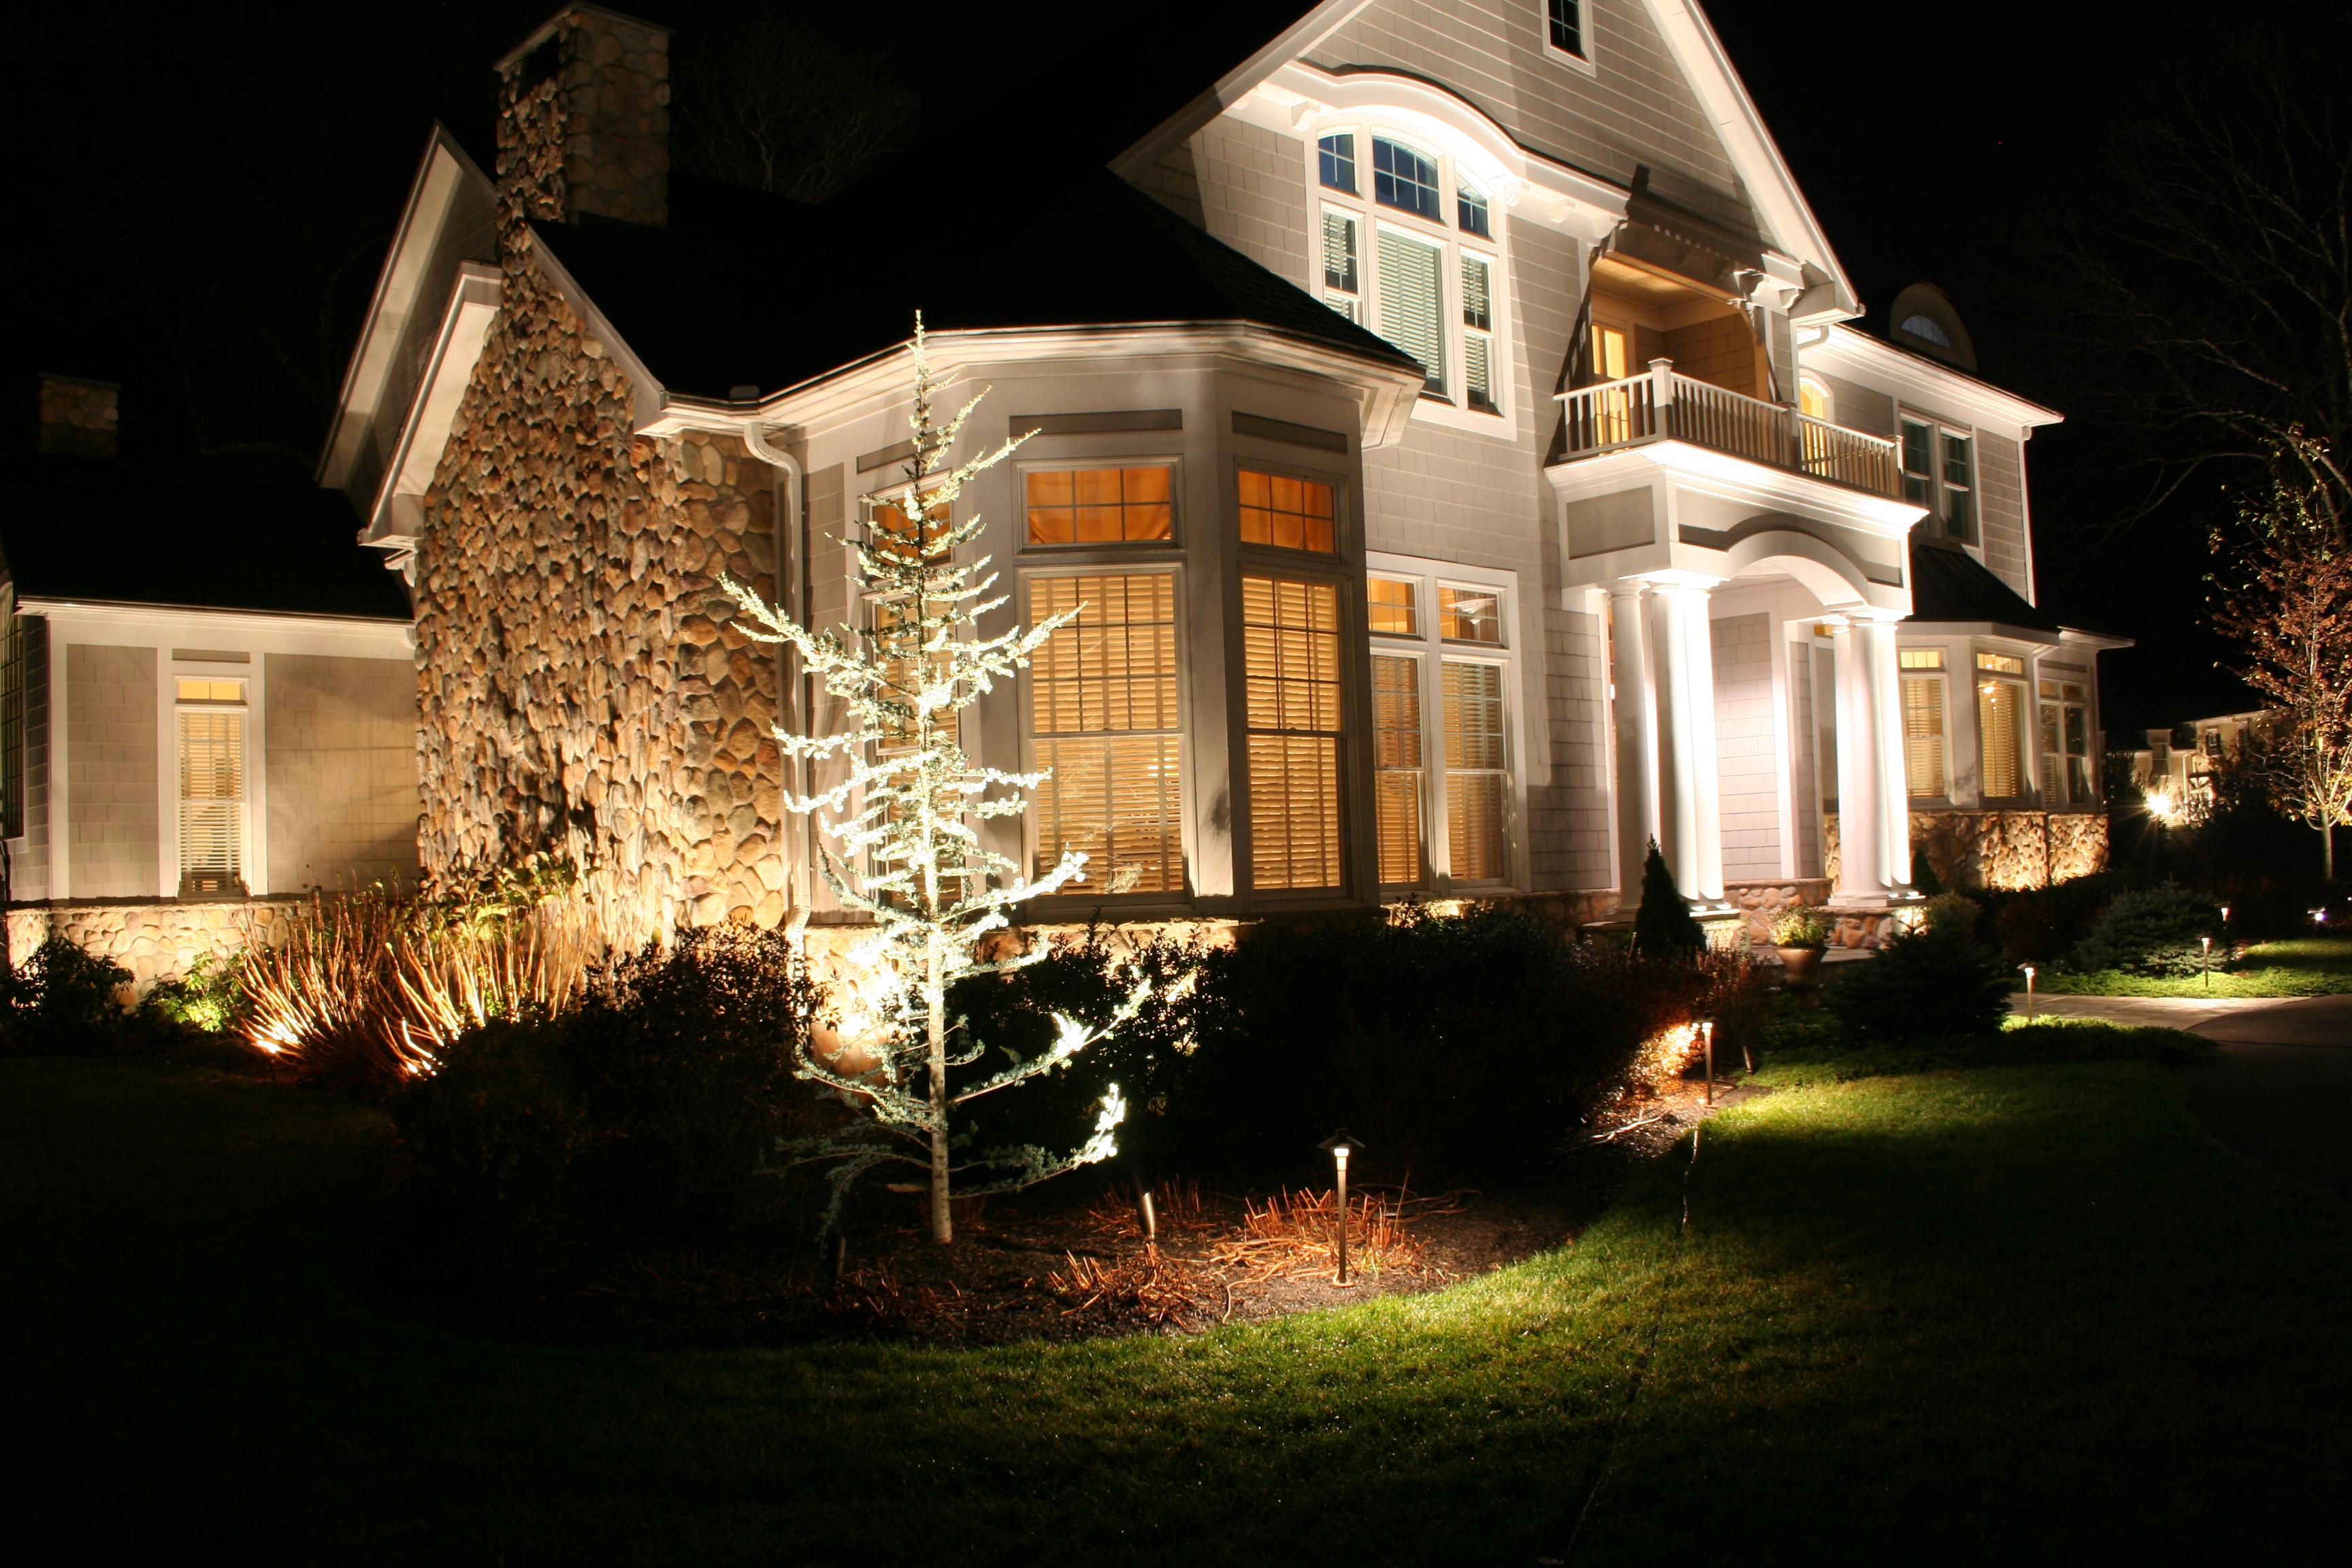 Atlas Supply Landscape Lighting : Landscape lighting designer michael gotowala shows us a